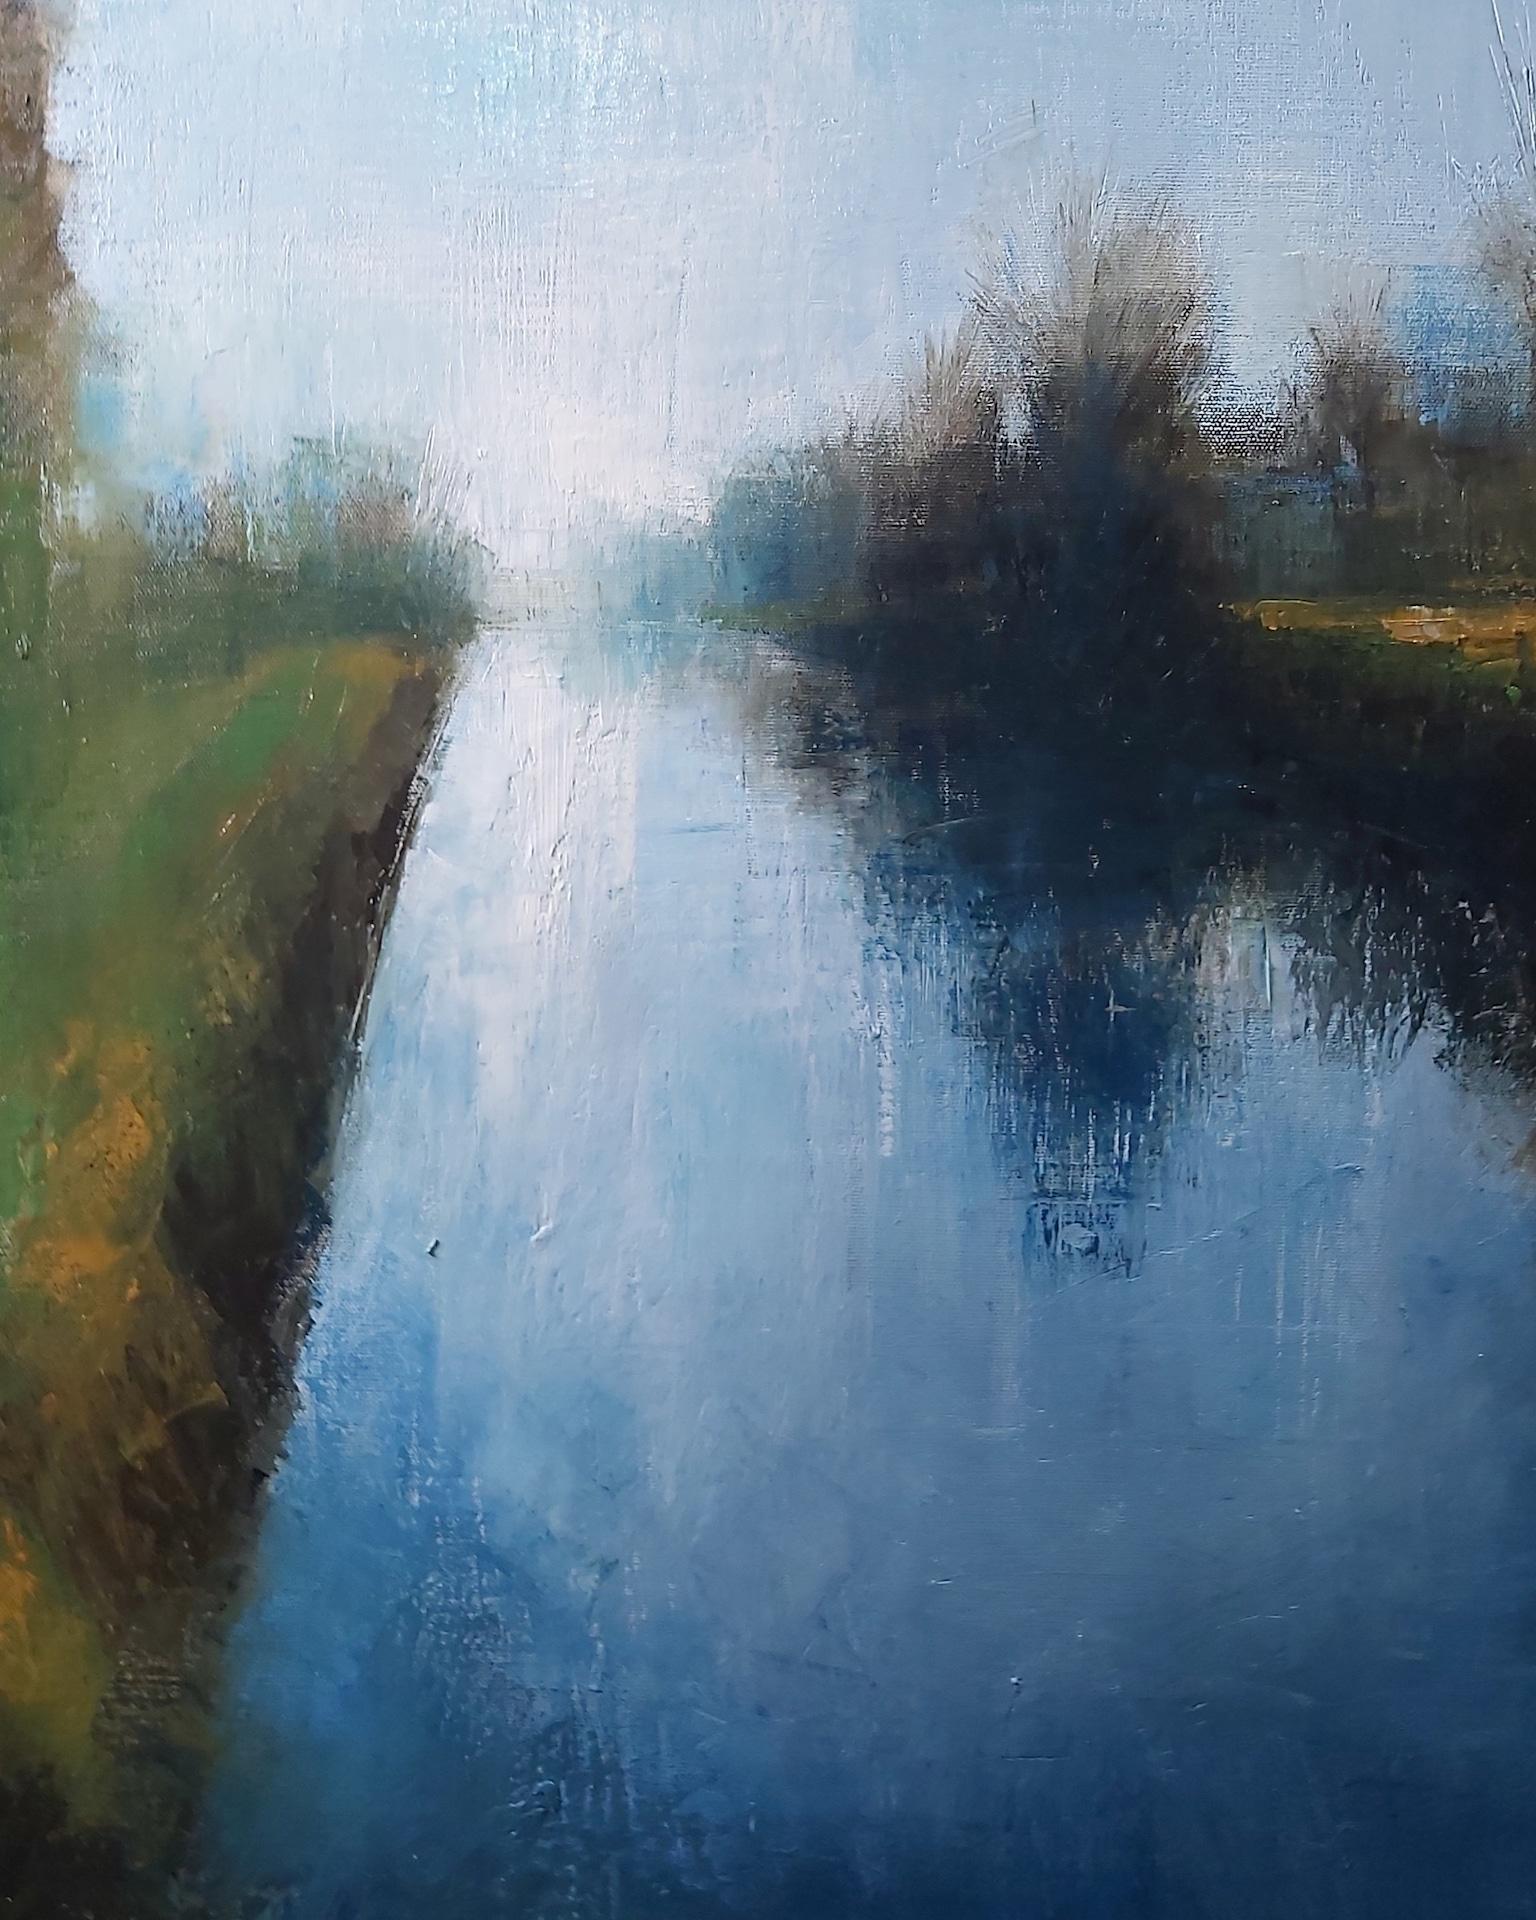 The Cut. 50/70cm. Oil on Linen. 2020. Landscape painting Norfolk Broads Beccles Art